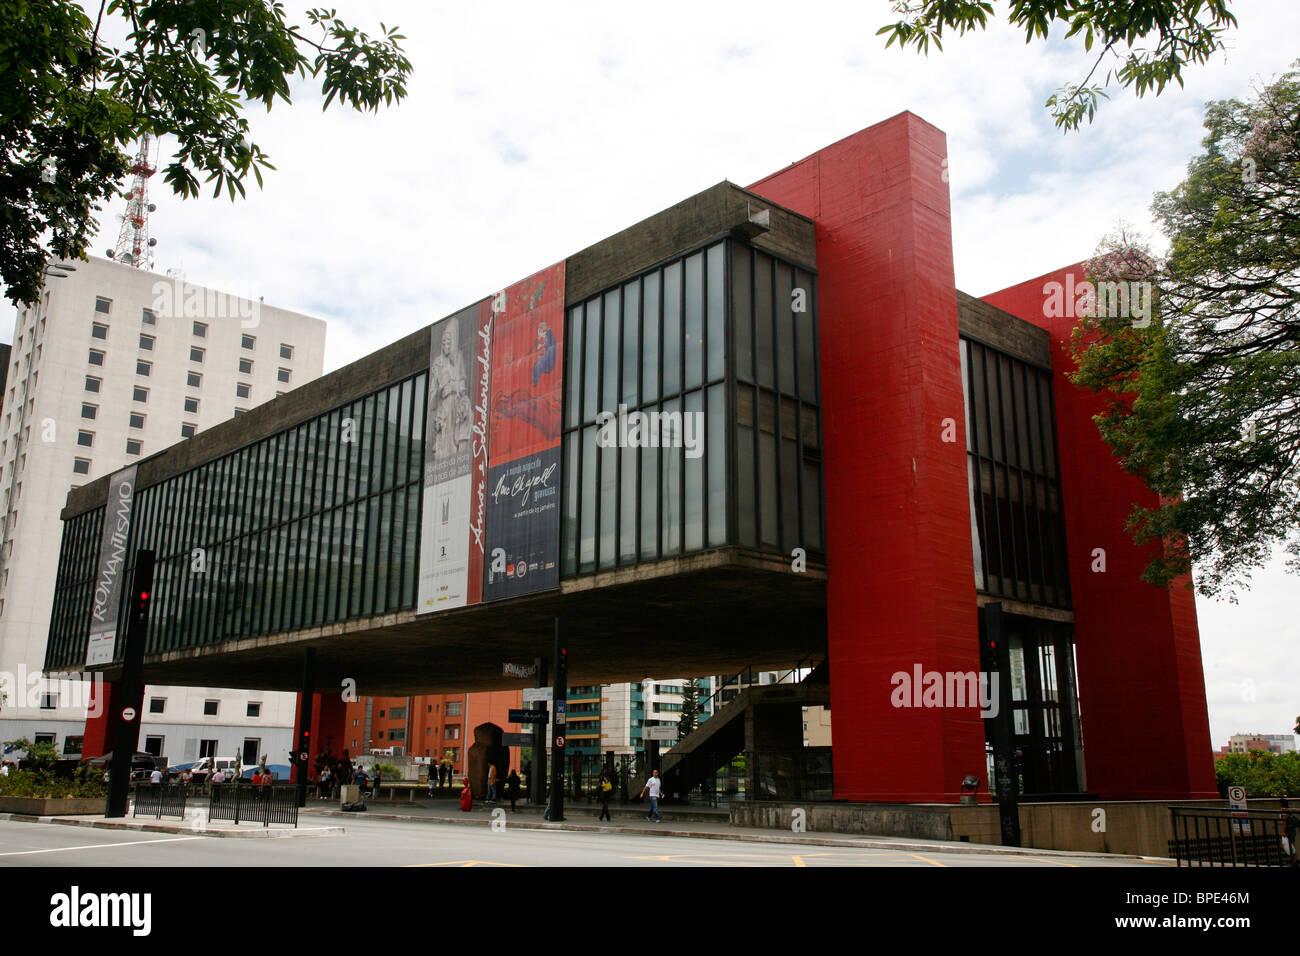 Il Museu de Arte de Sao Paulo (MASP), Sao Paulo, Brasile. Immagini Stock